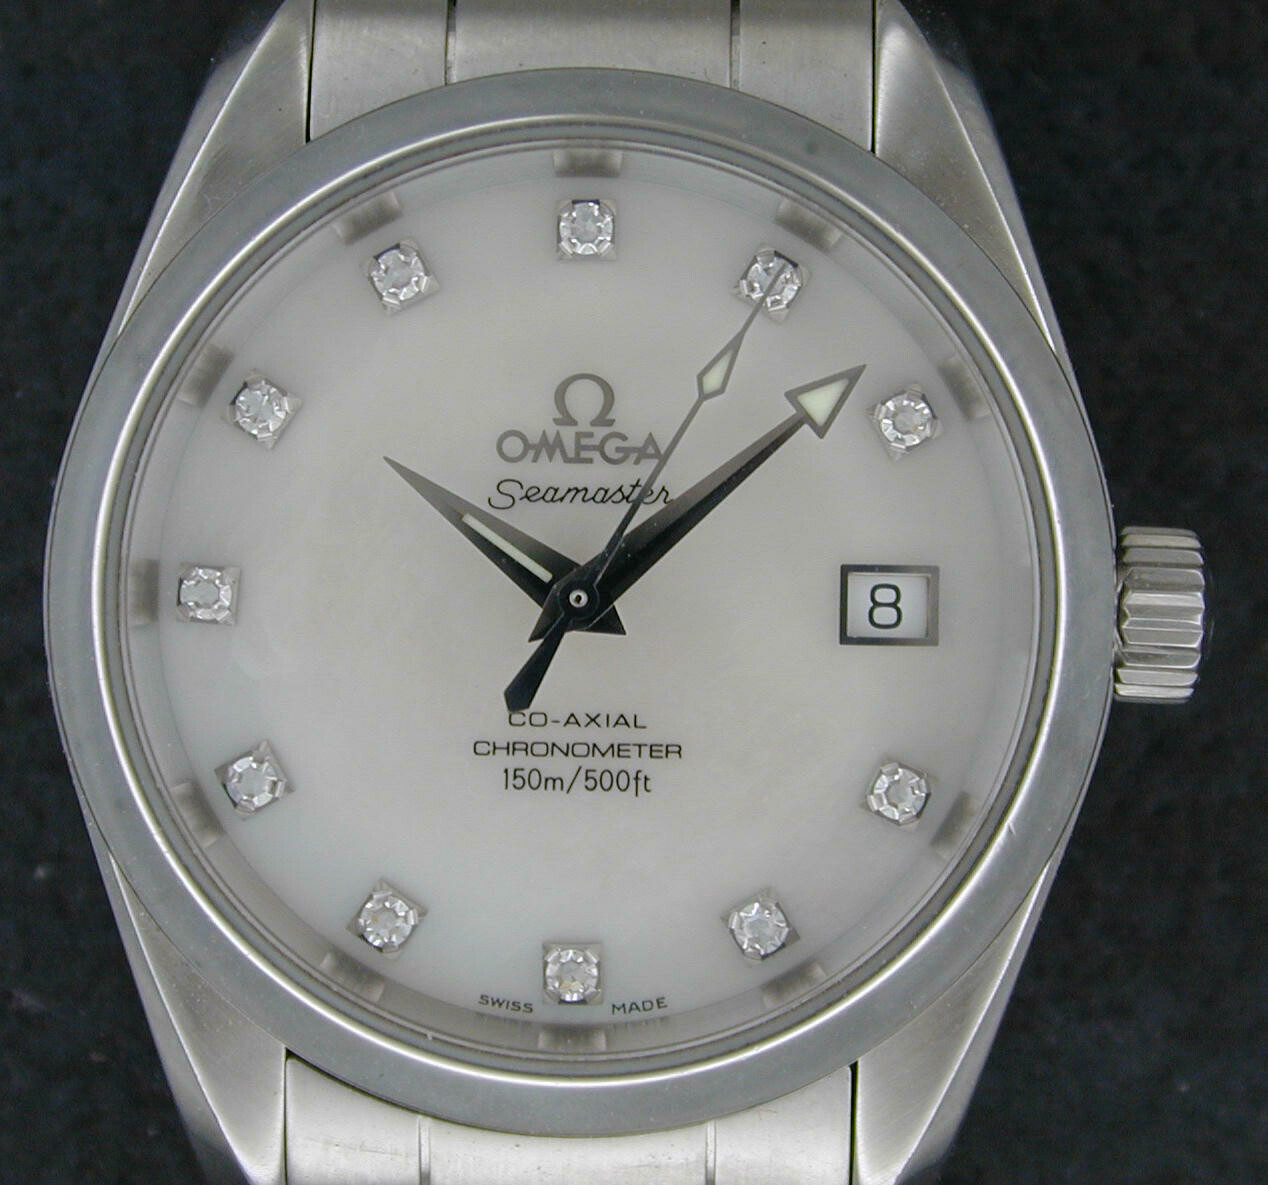 Omega Seamaster Co-axial Chronometer